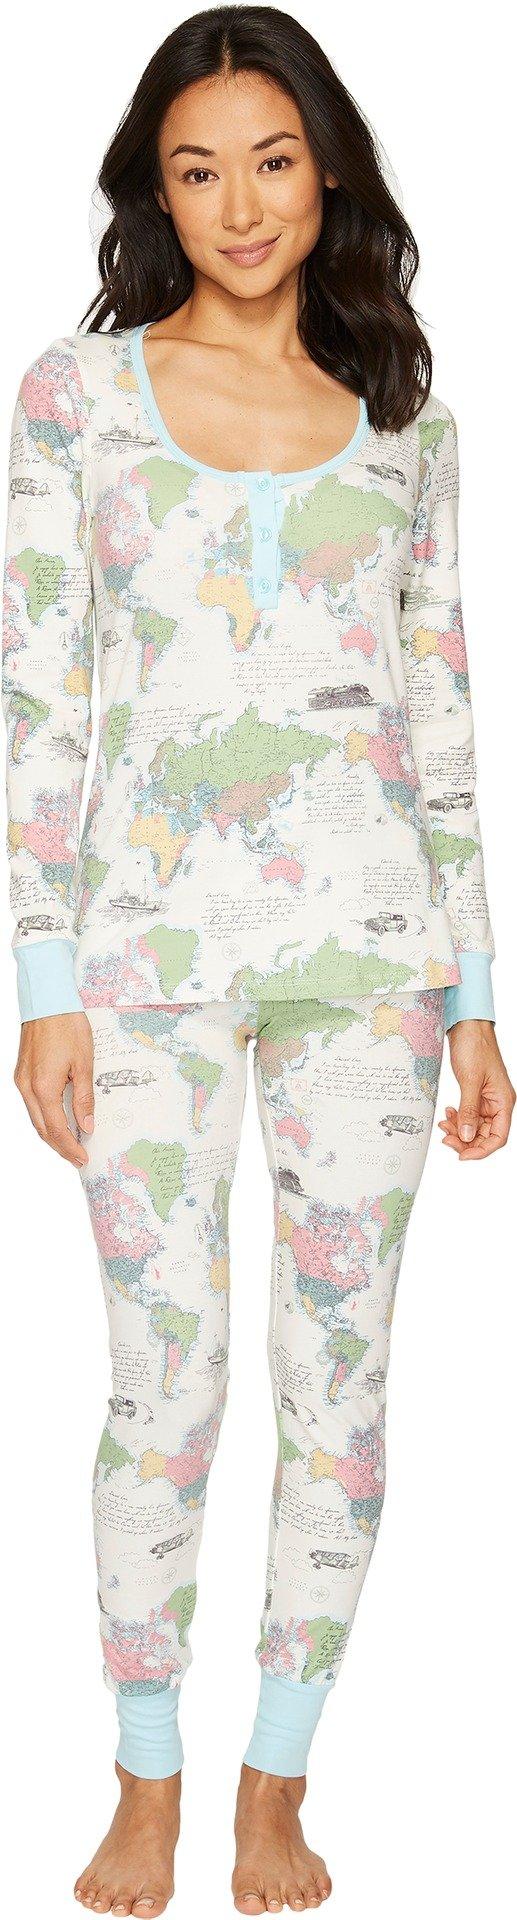 BedHead Women's Long Sleeve Stretch Knit Henley Pajama Set Travel Journal X-Small